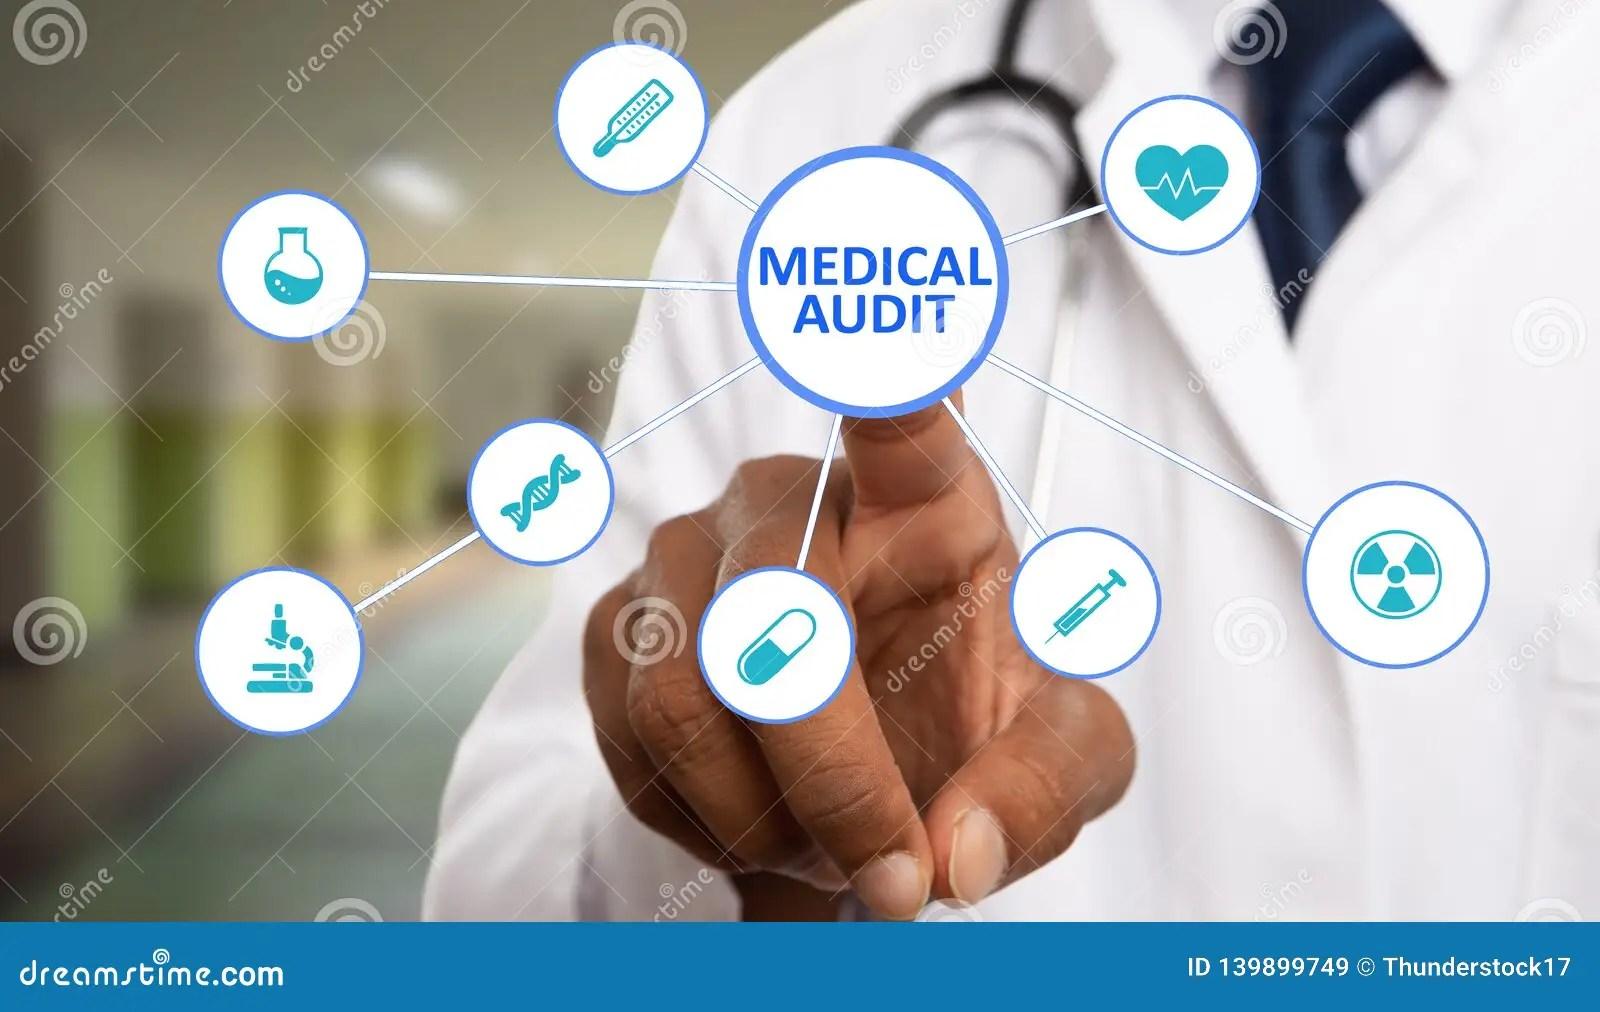 Medic Touching Medical Audit Text On Display Stock Image